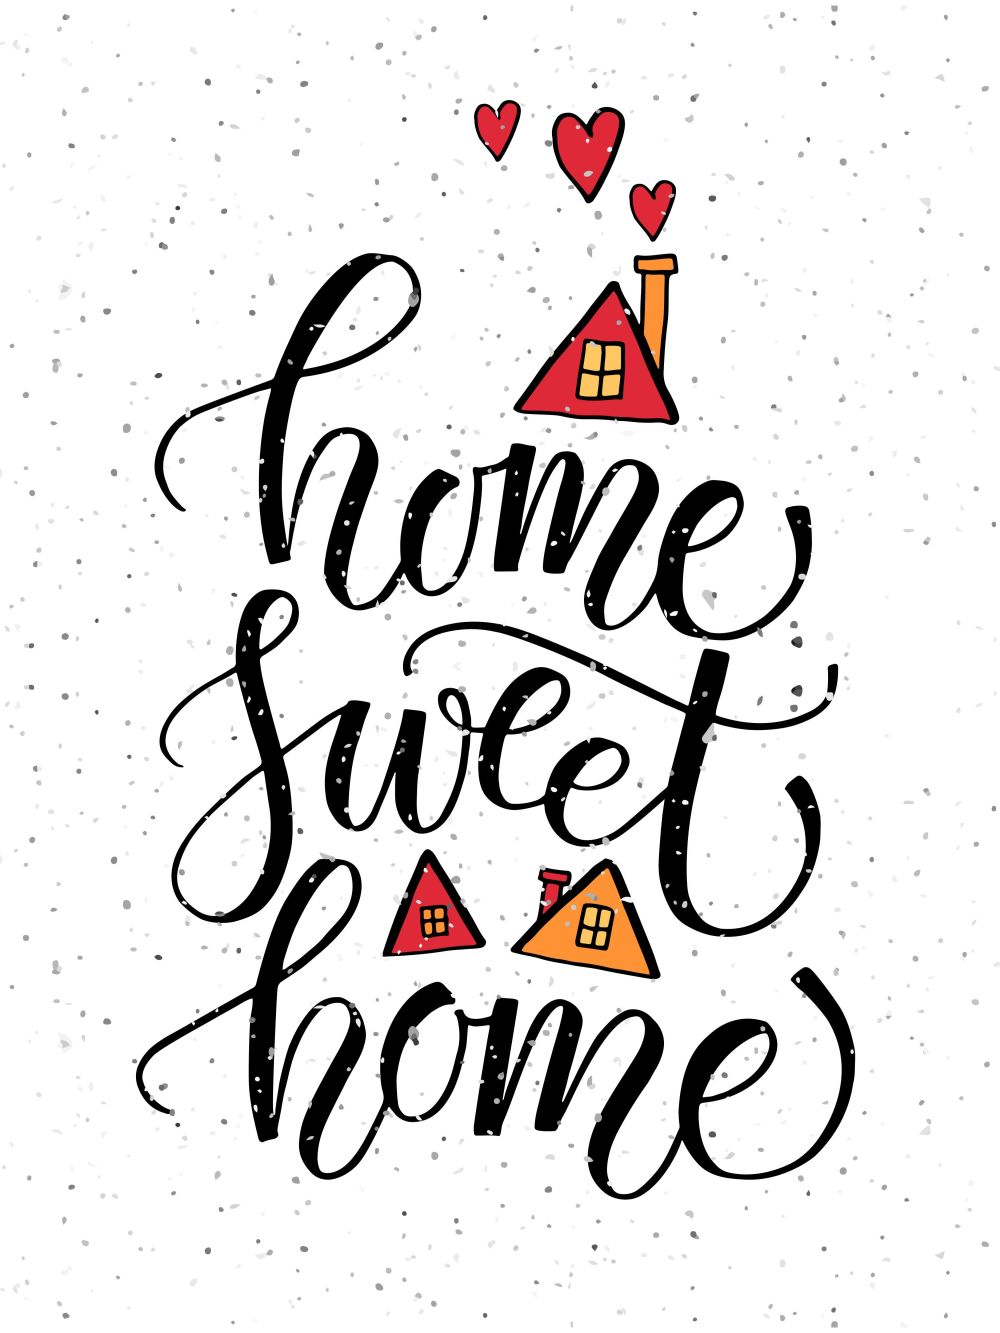 Home Sweet Home Typography Poster by Svetlana Kurako on @creativemarket